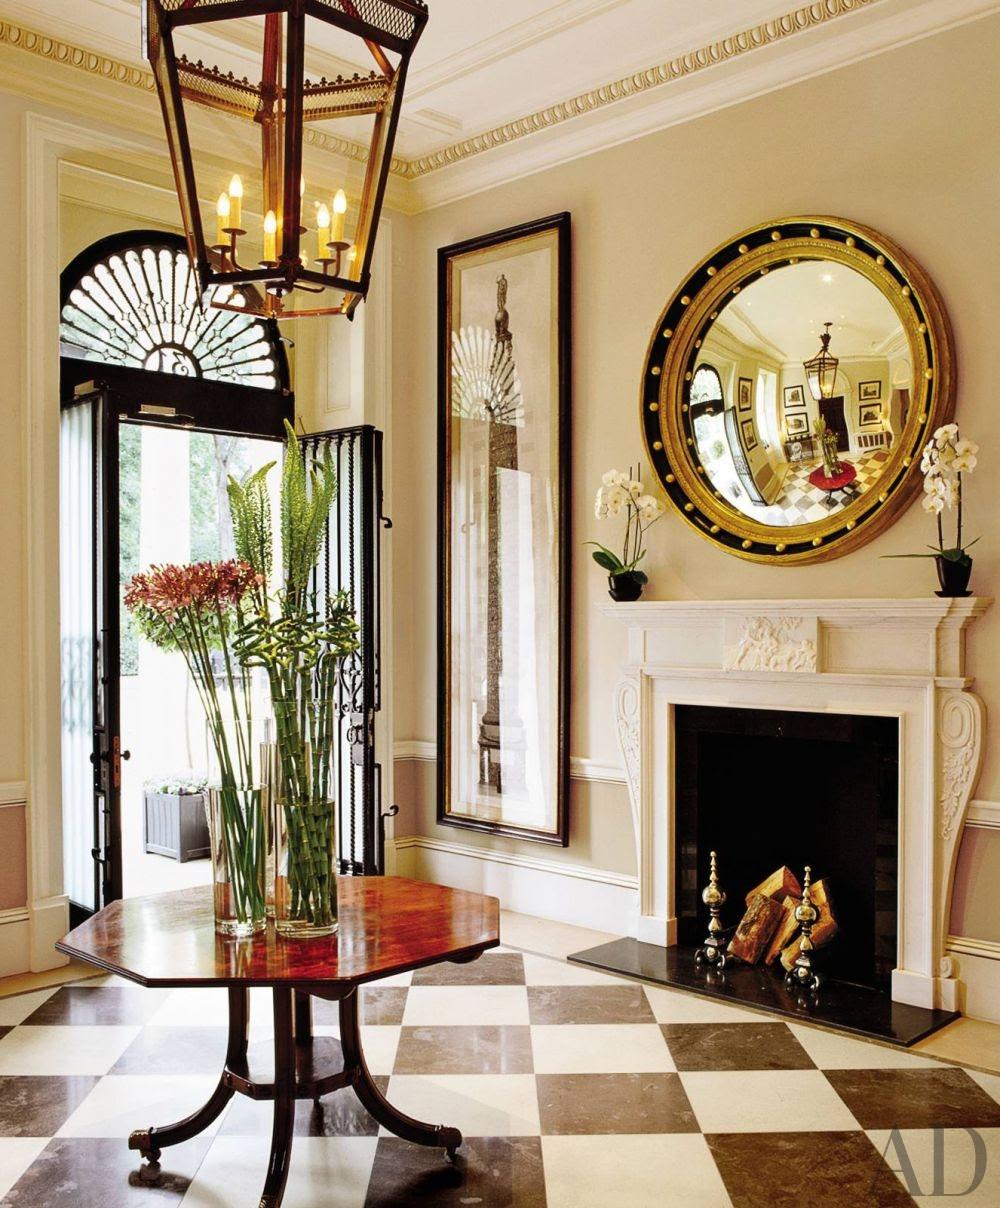 Cool Ideas for Entry Table Decor - HomeStyleDiary.com